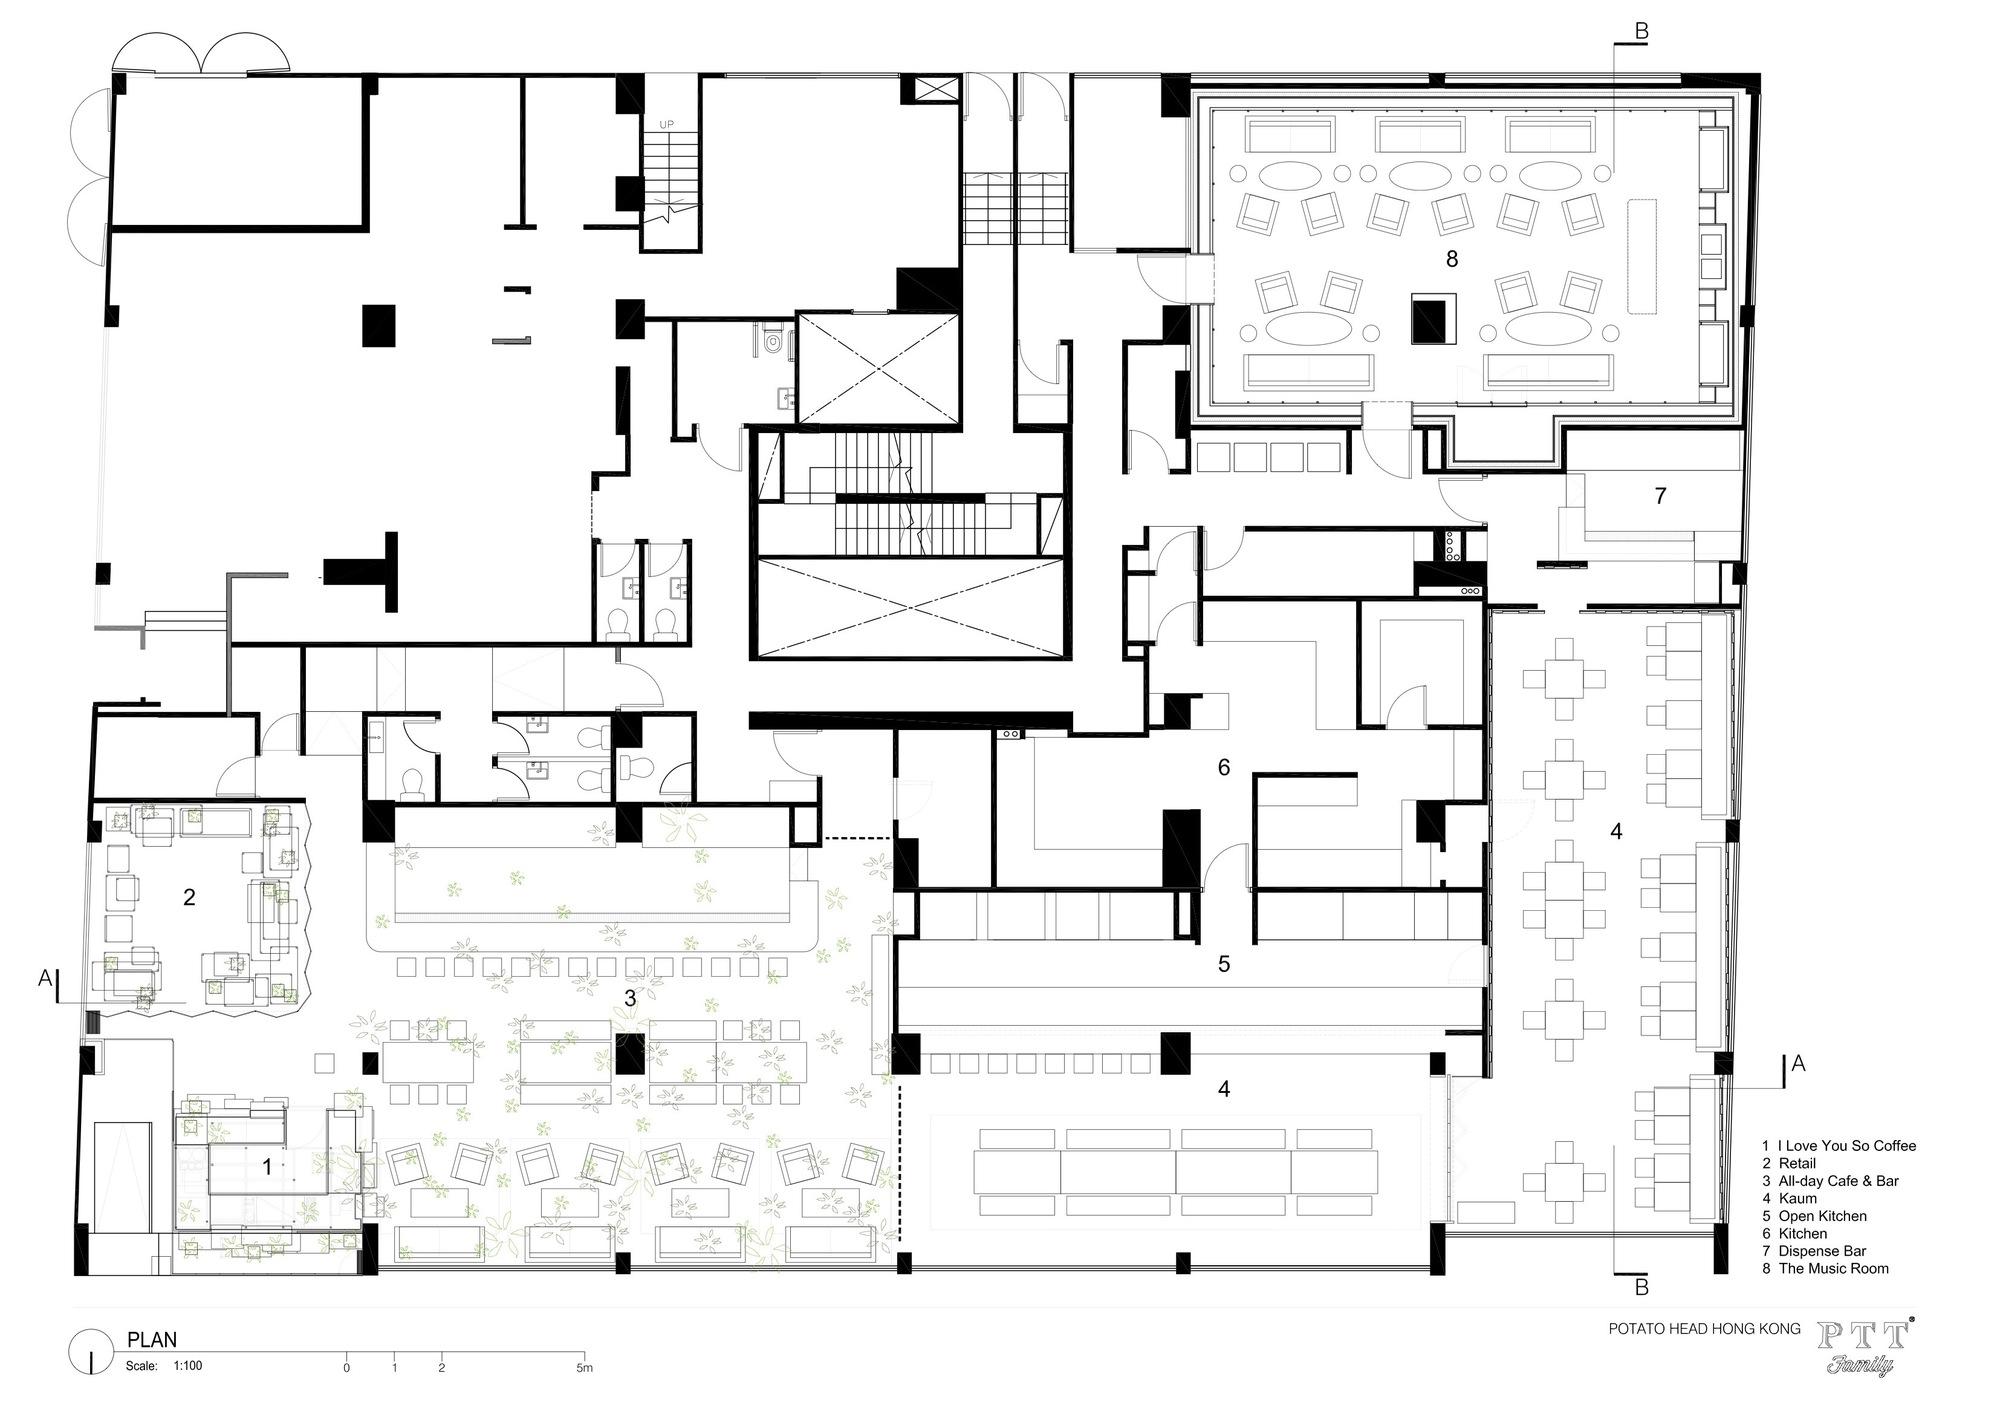 Gallery Of Potato Head Hong Kong Sou Fujimoto Architects